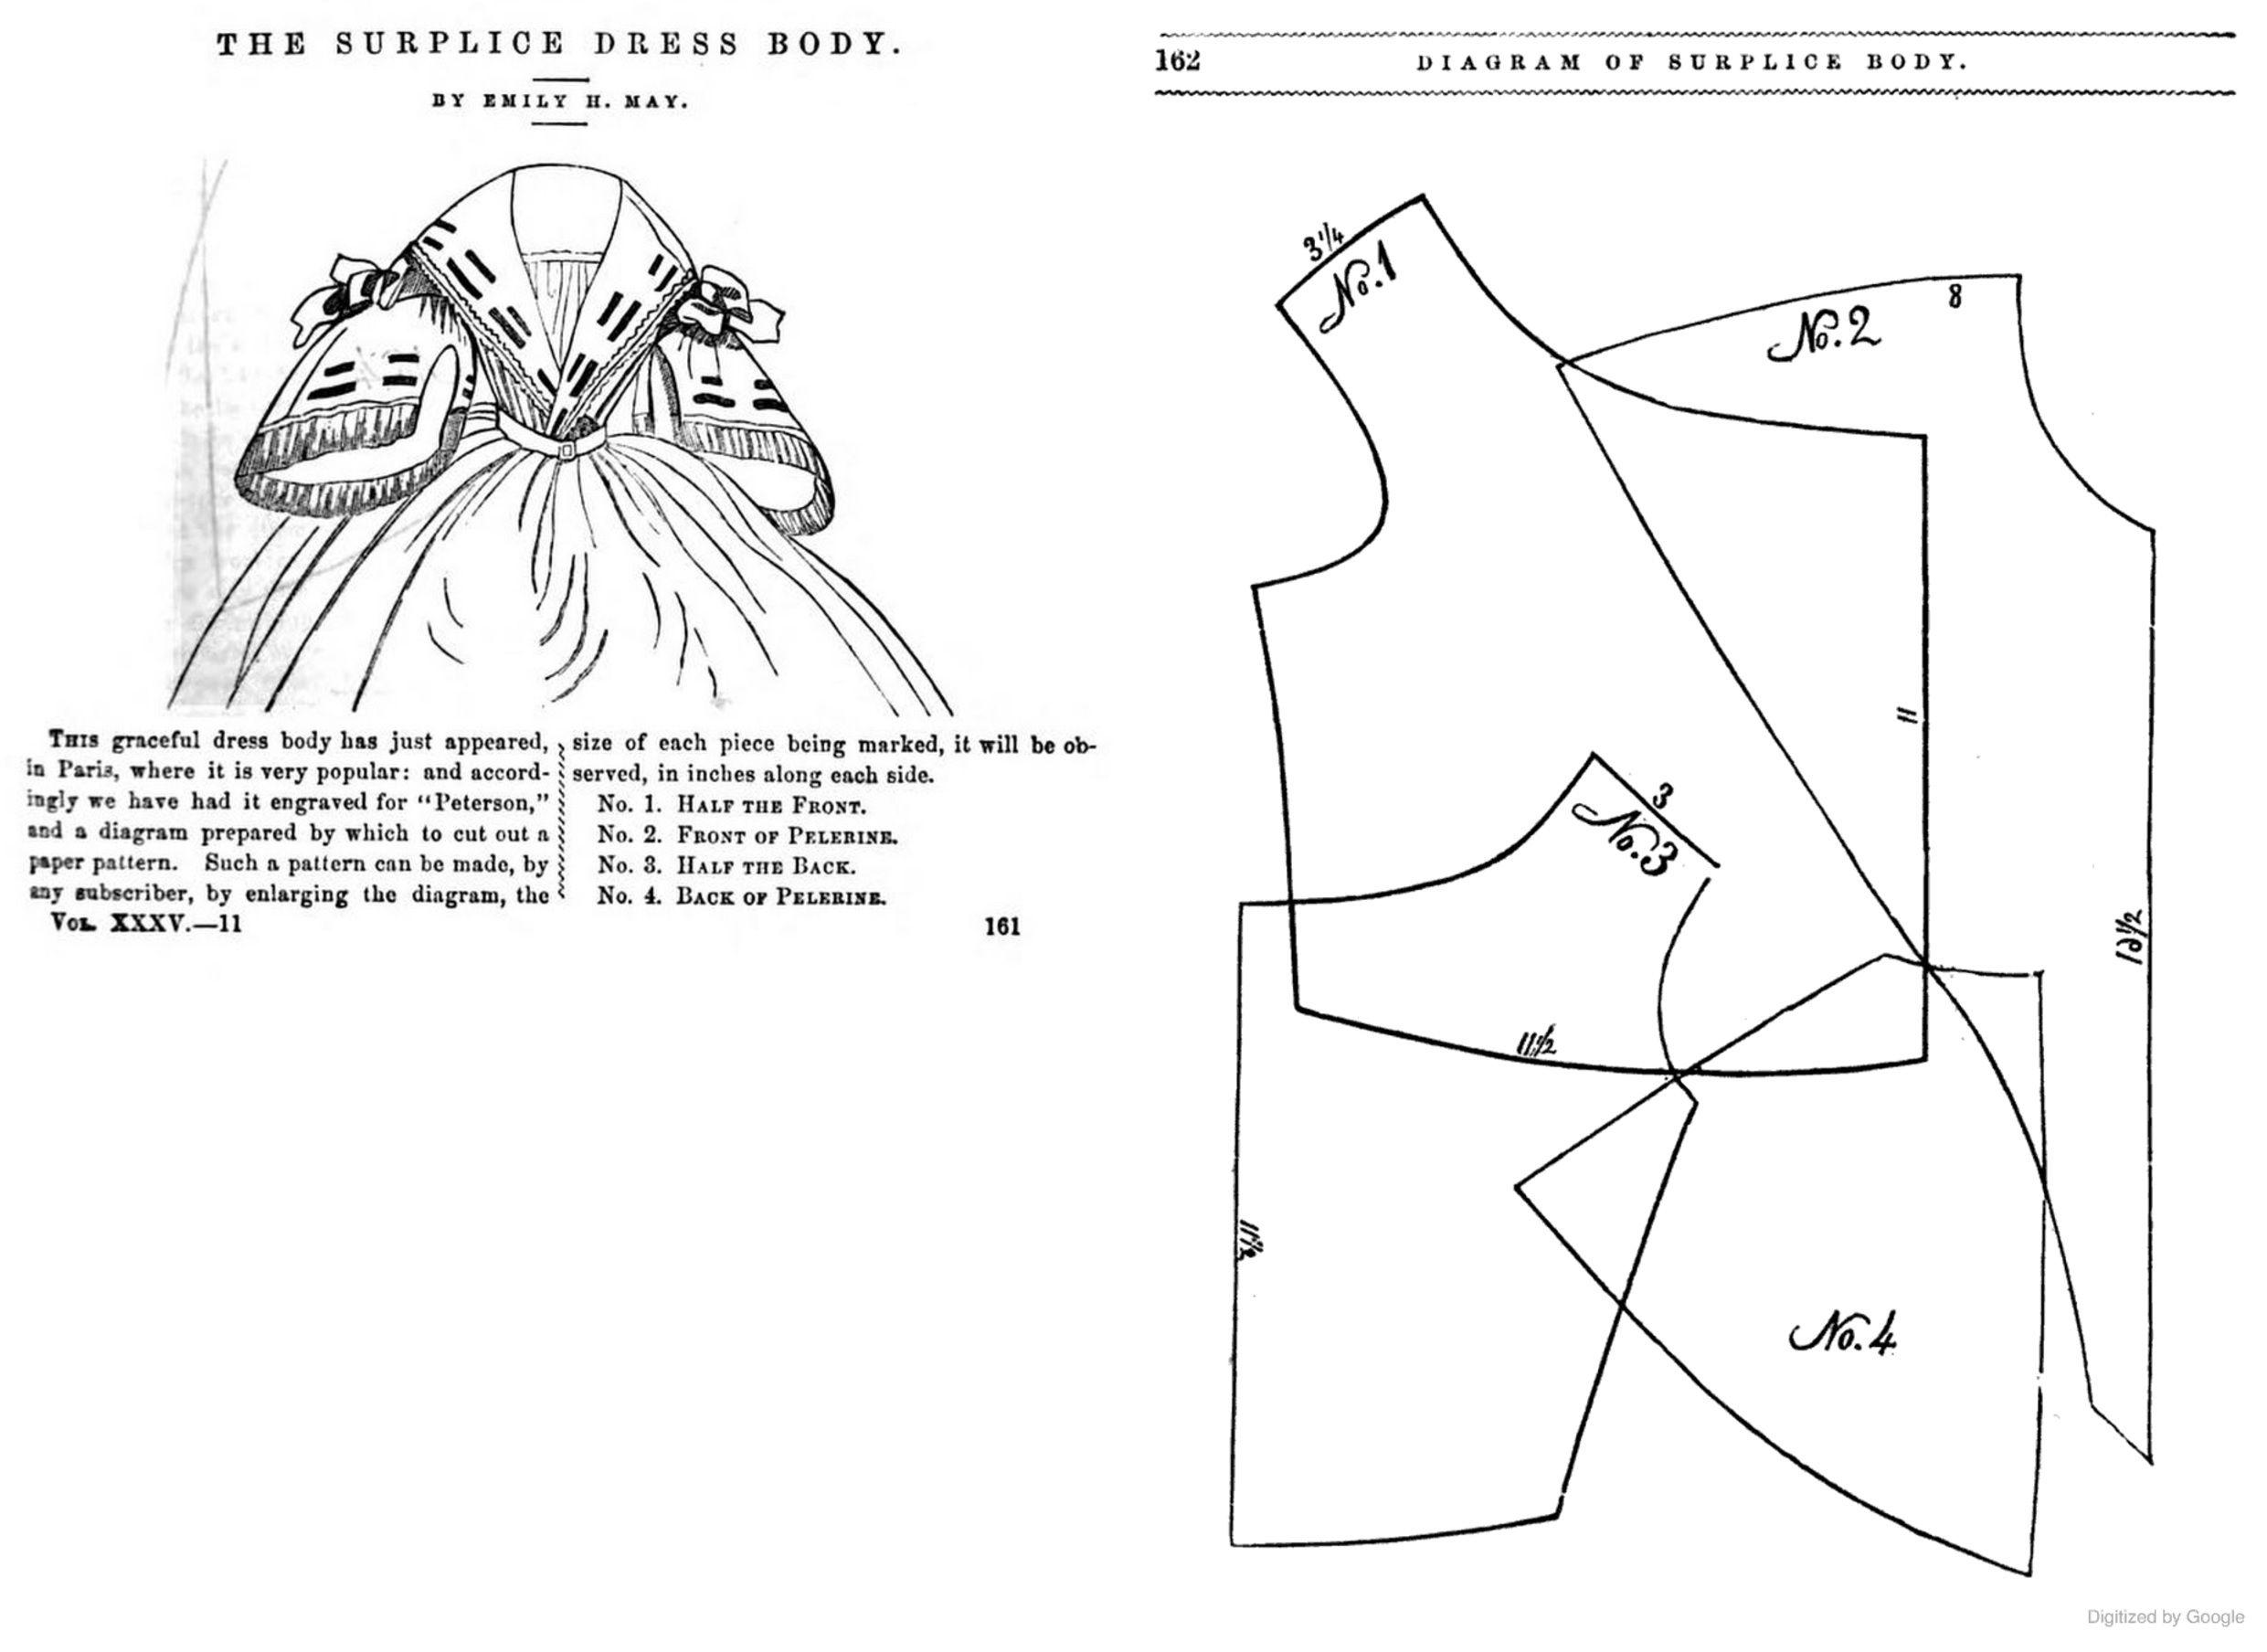 1859 Surplice Body- Pattern from Peterson's Magazine